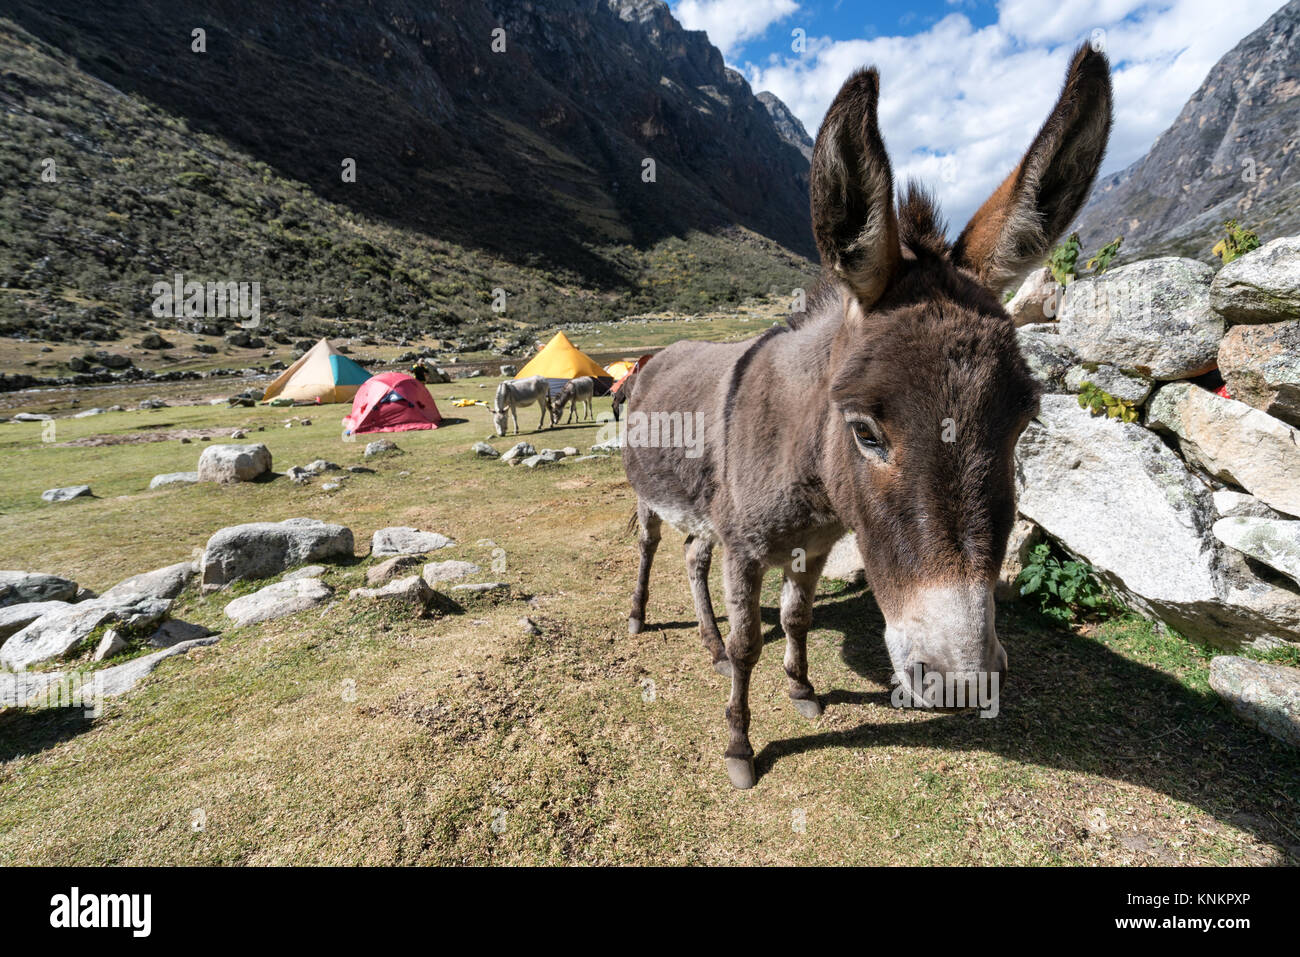 Curiour donkey at Santa Cruz valley, Cordillera Blanca, Peru - Stock Image